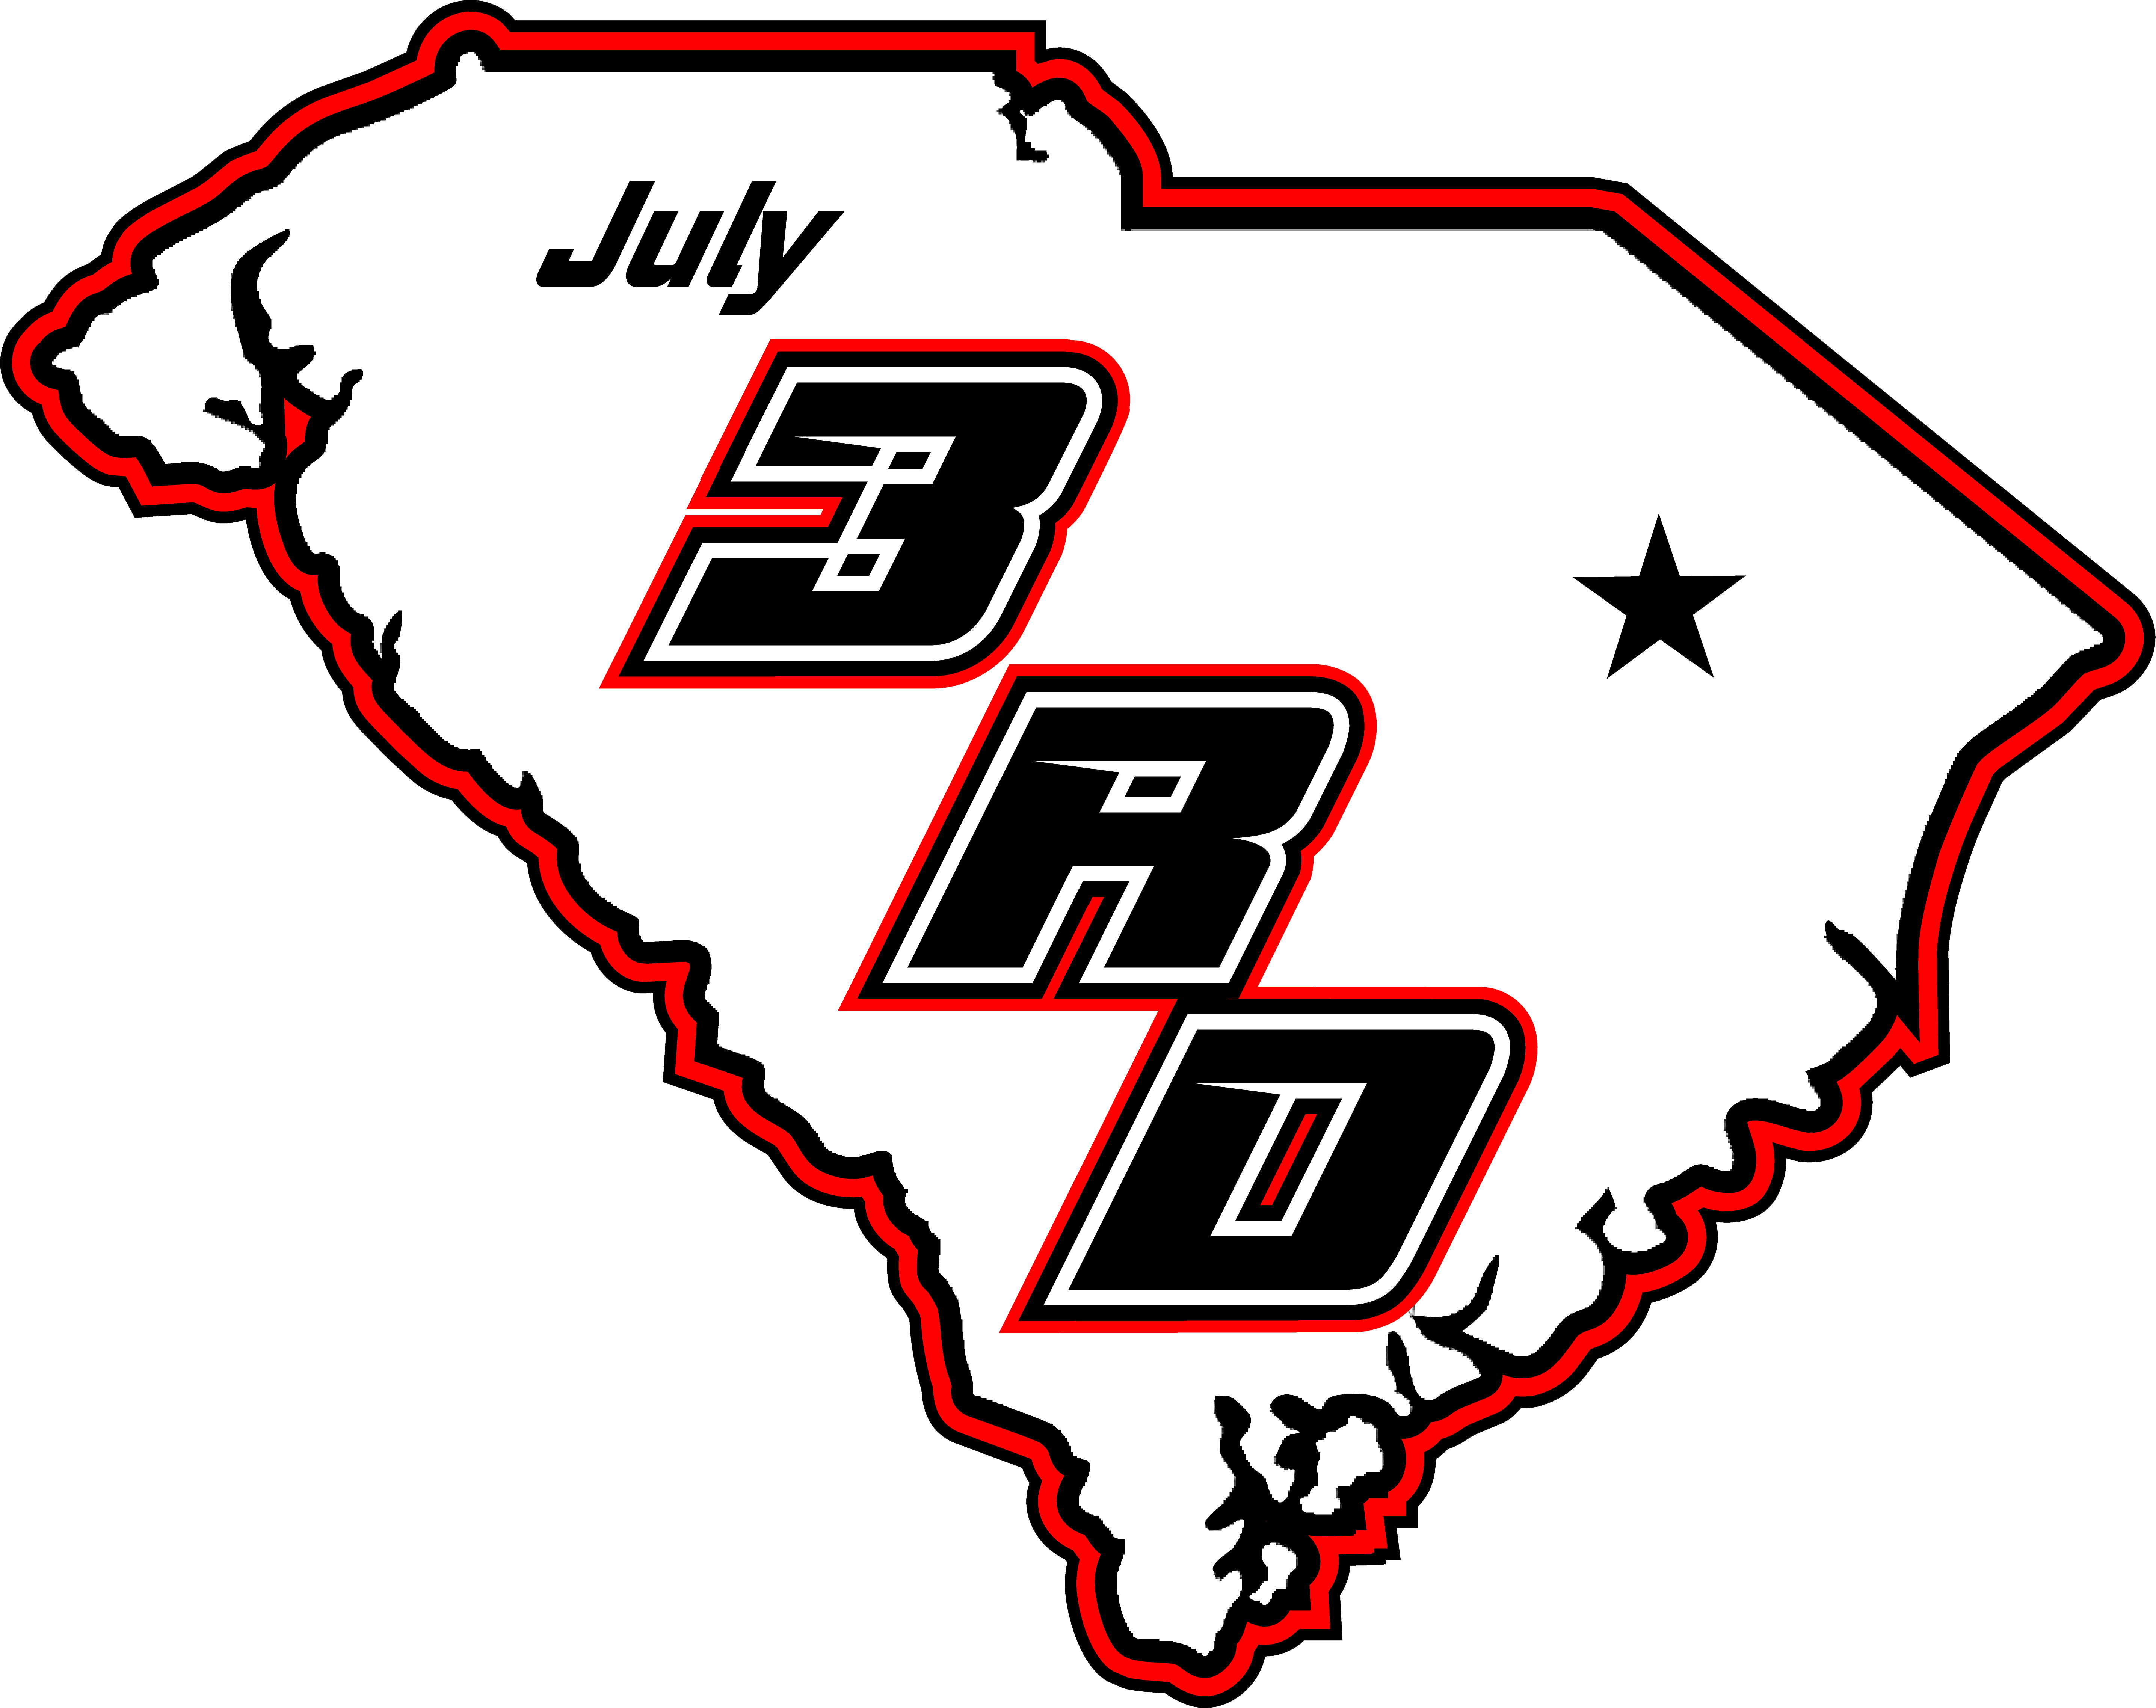 Date Logo 7.3